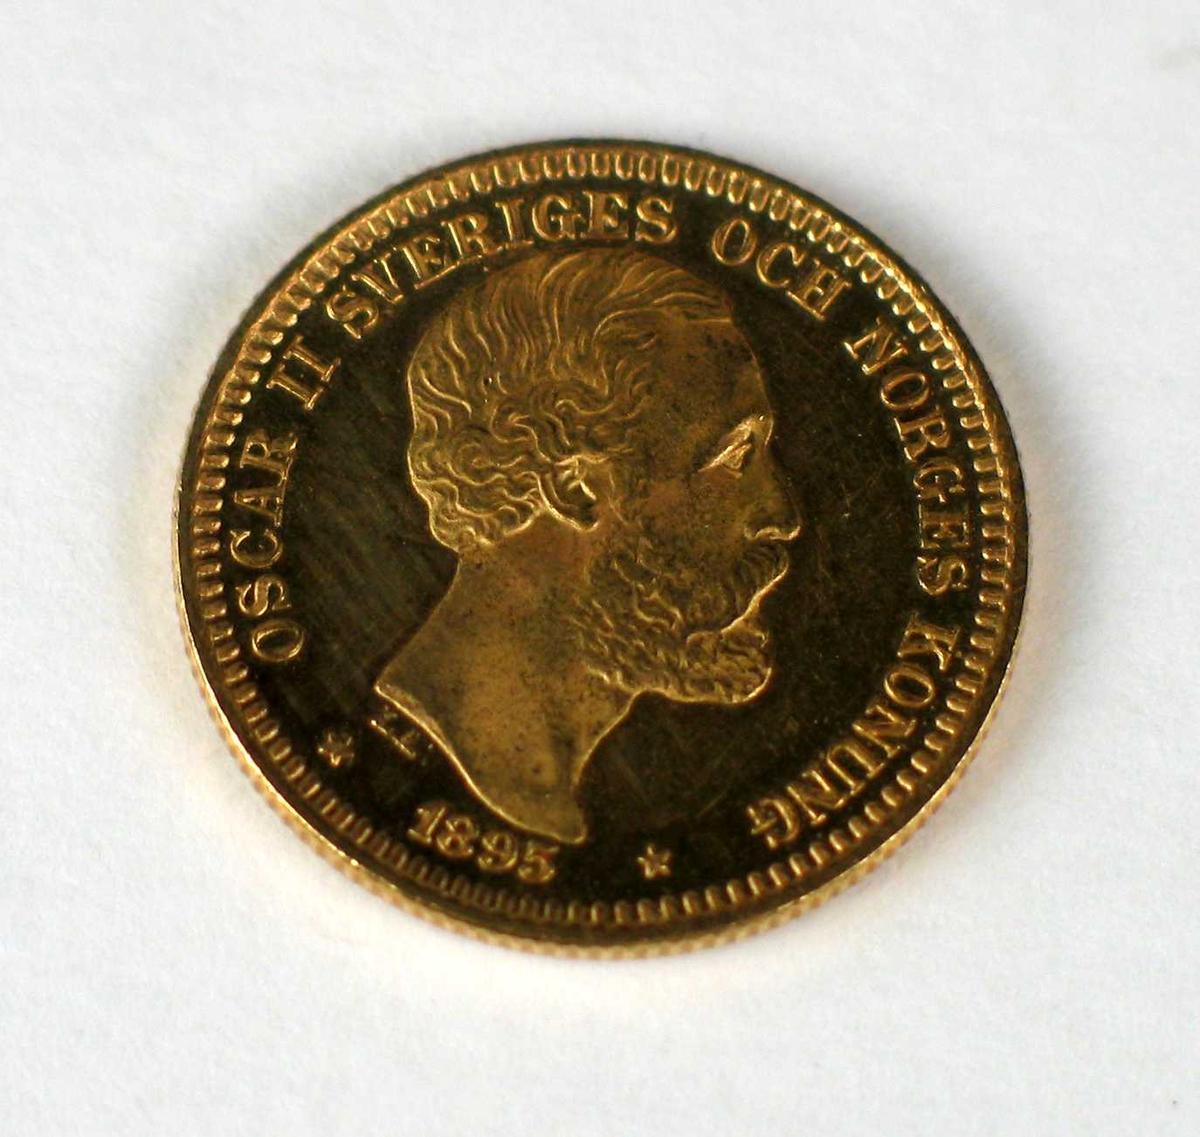 En 20-krone i gull med Oscar II's portrett.